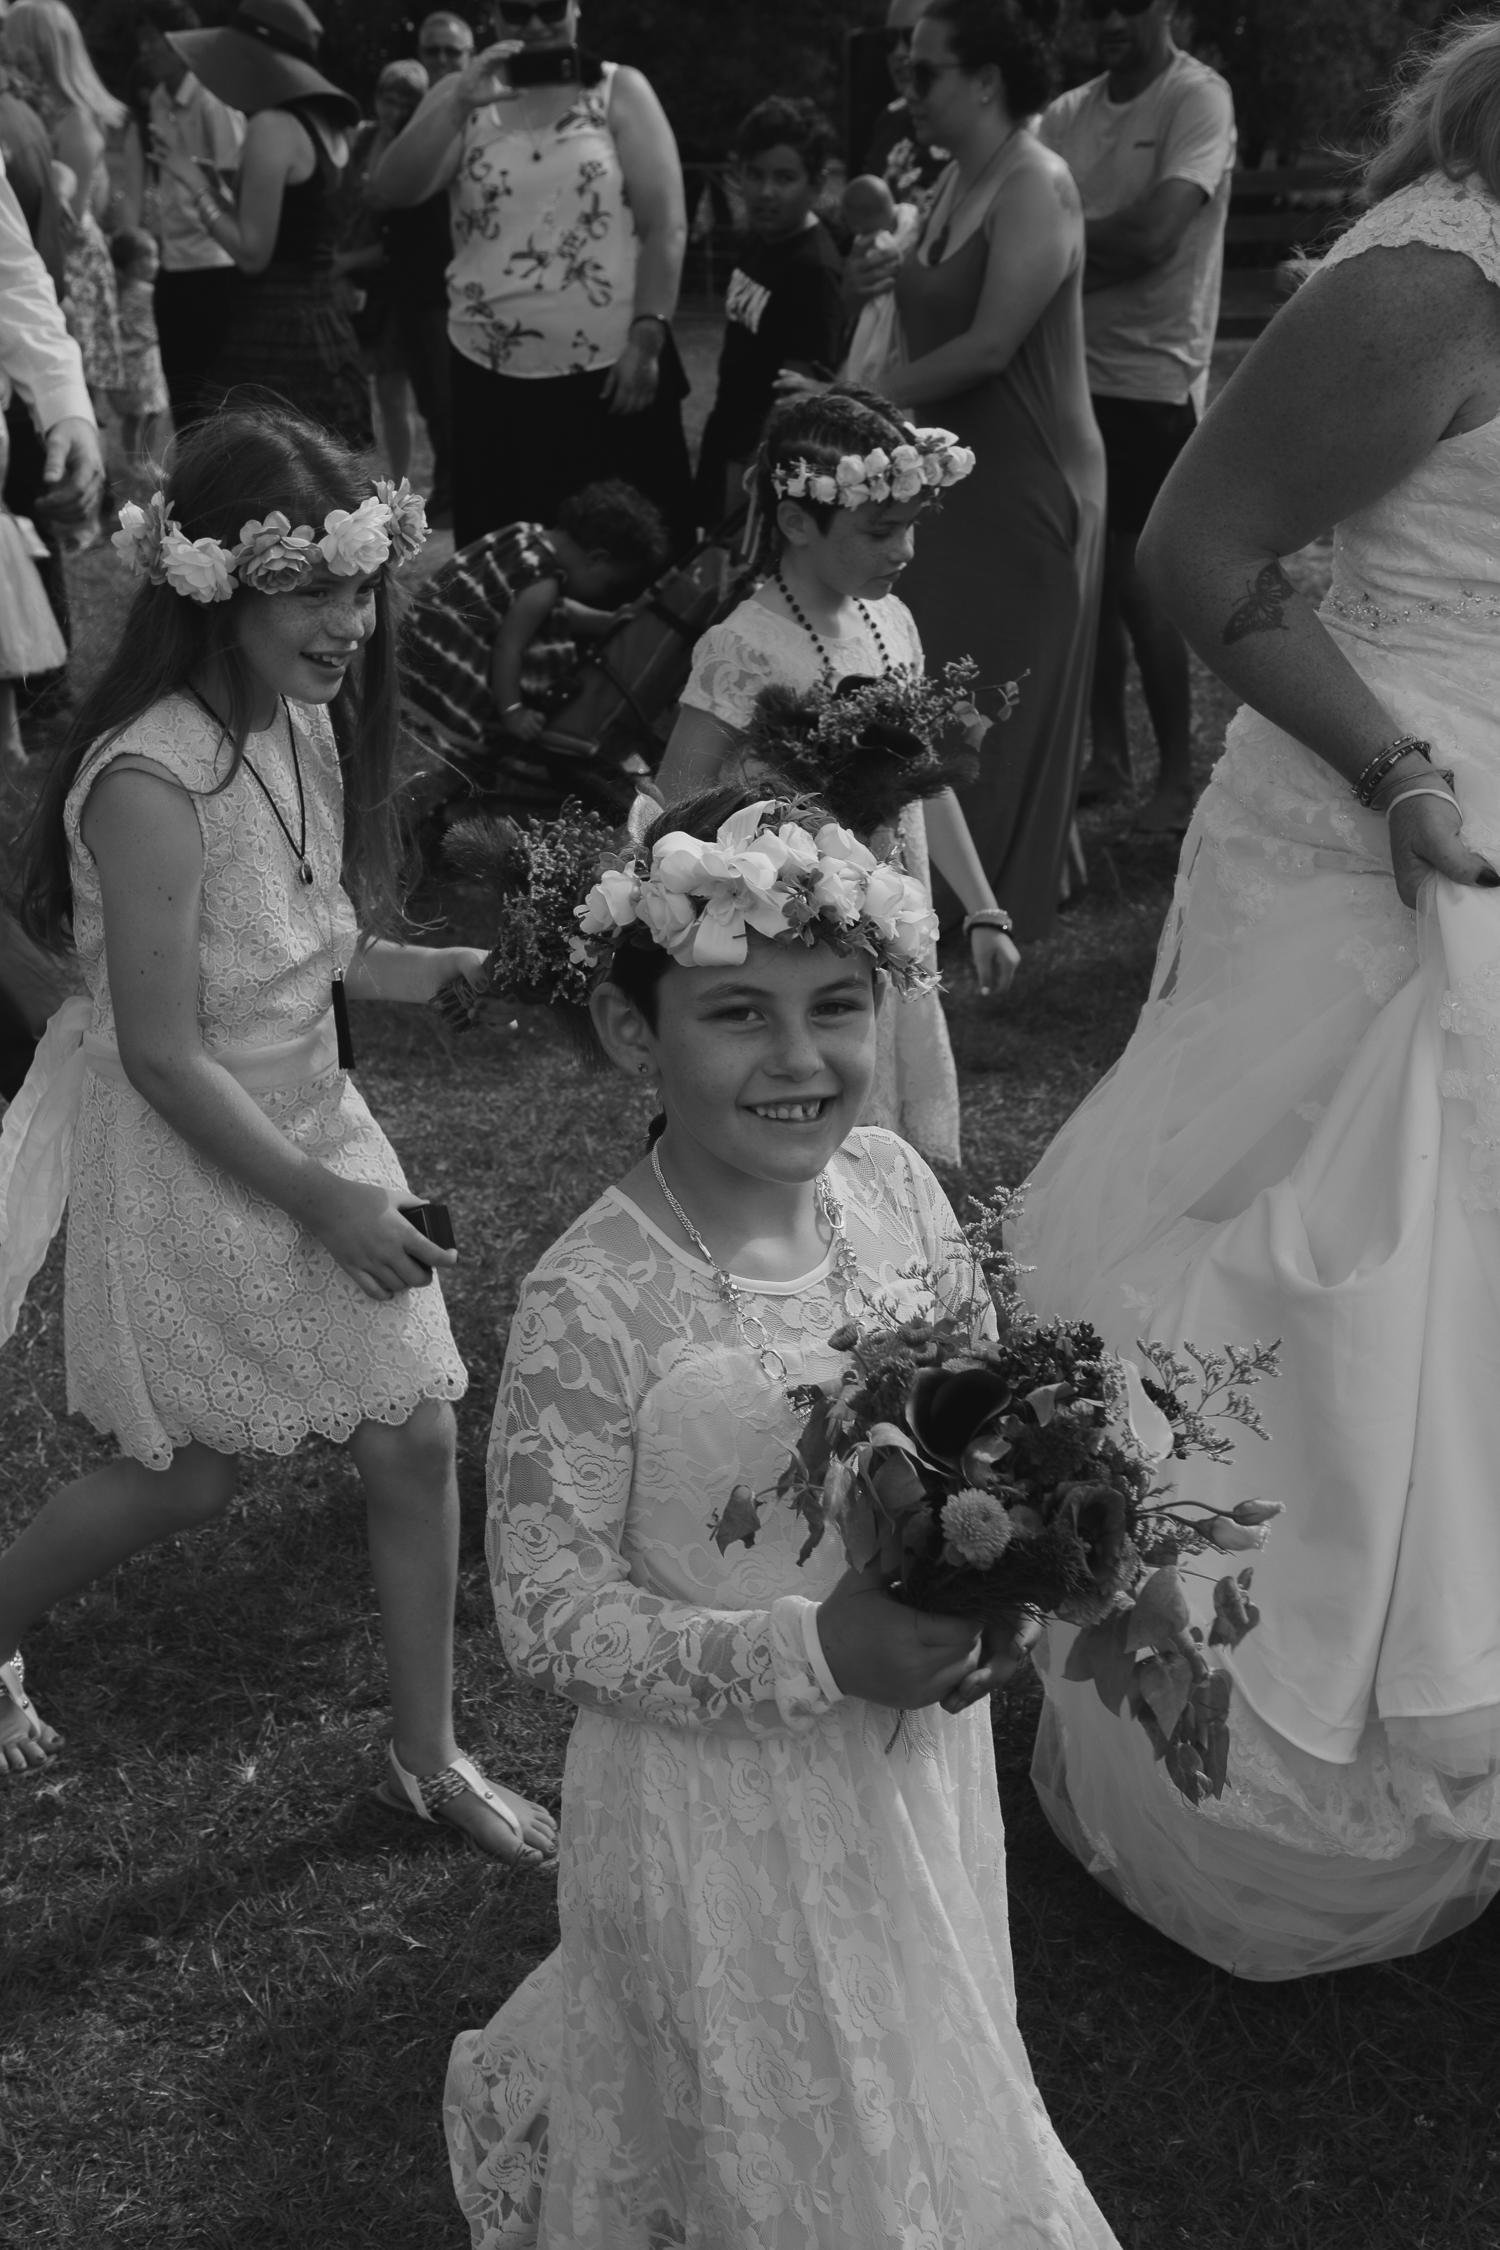 wedding-photography-flower-girls-walking-with-precession.jpg